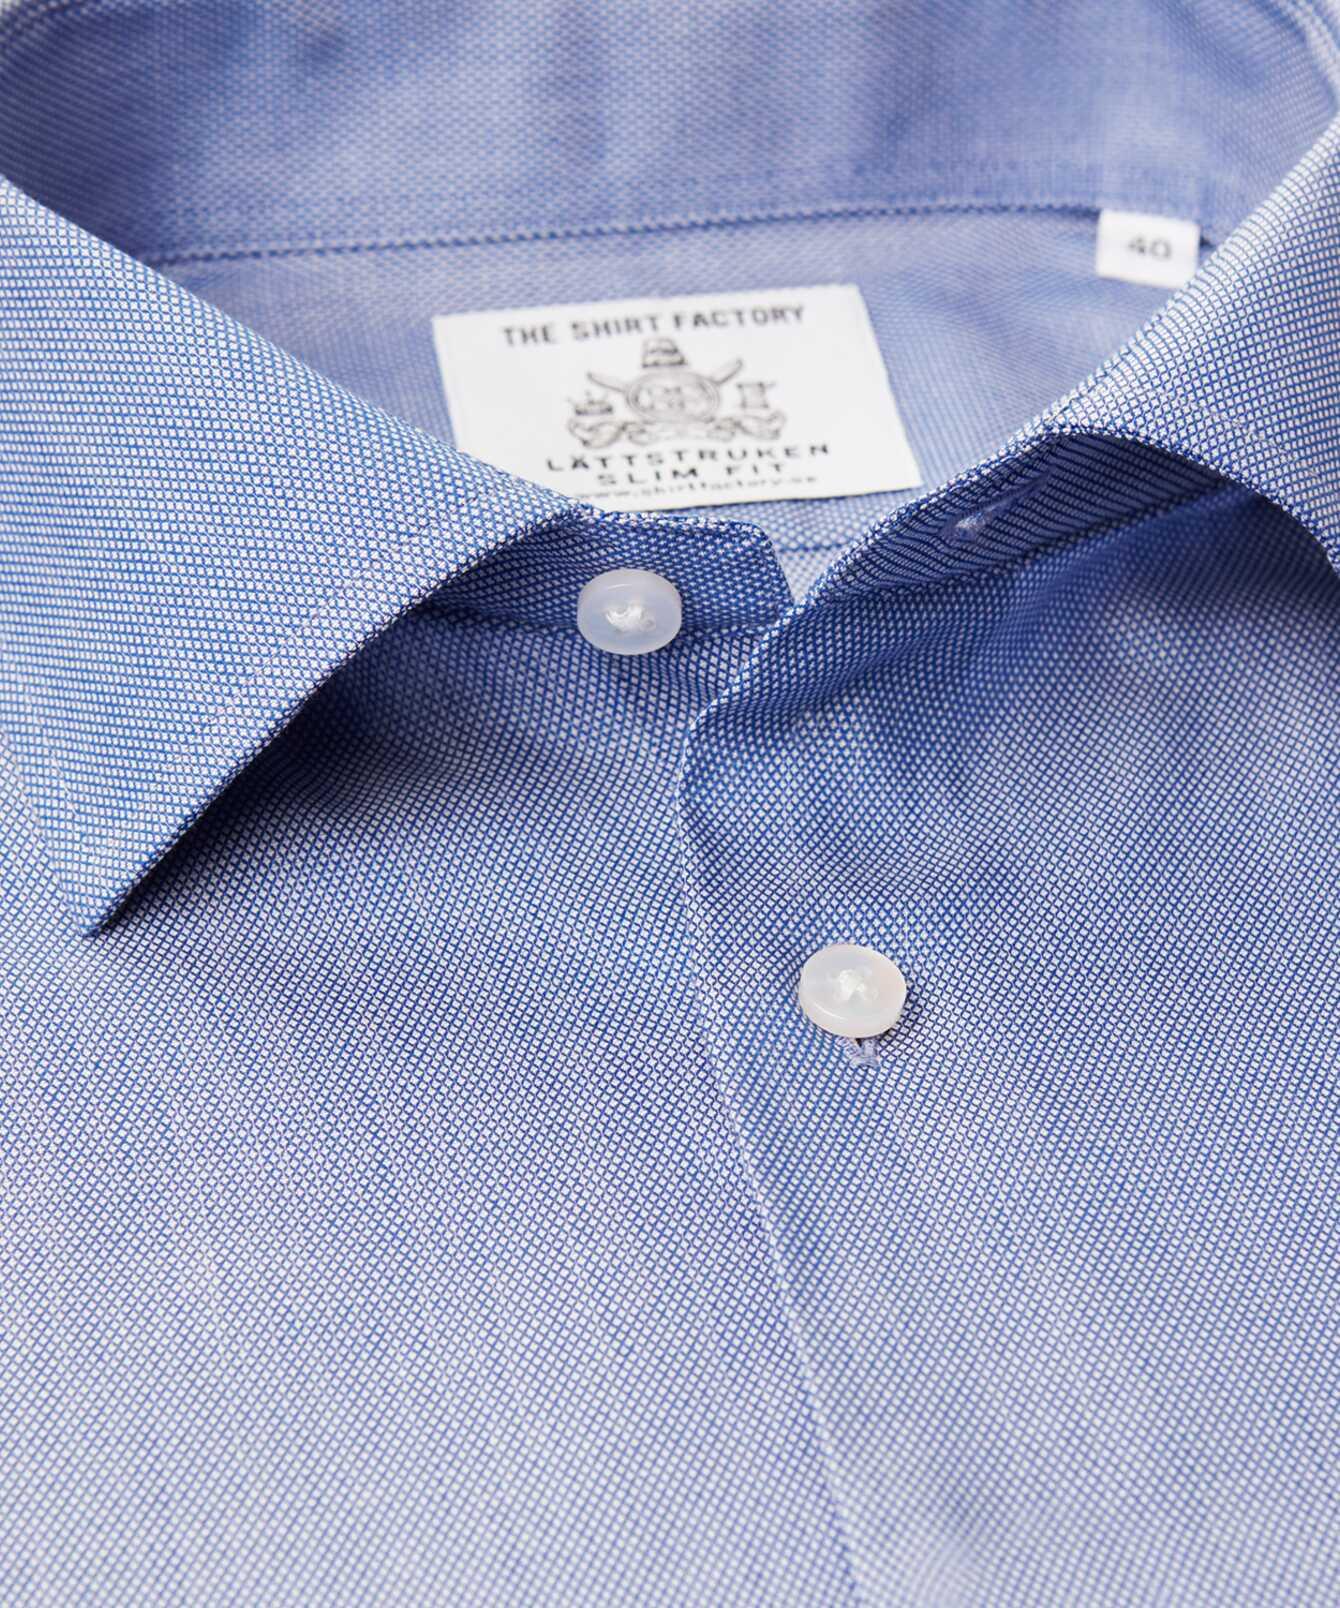 Skjorta E I Cardiff The Shirt Factory